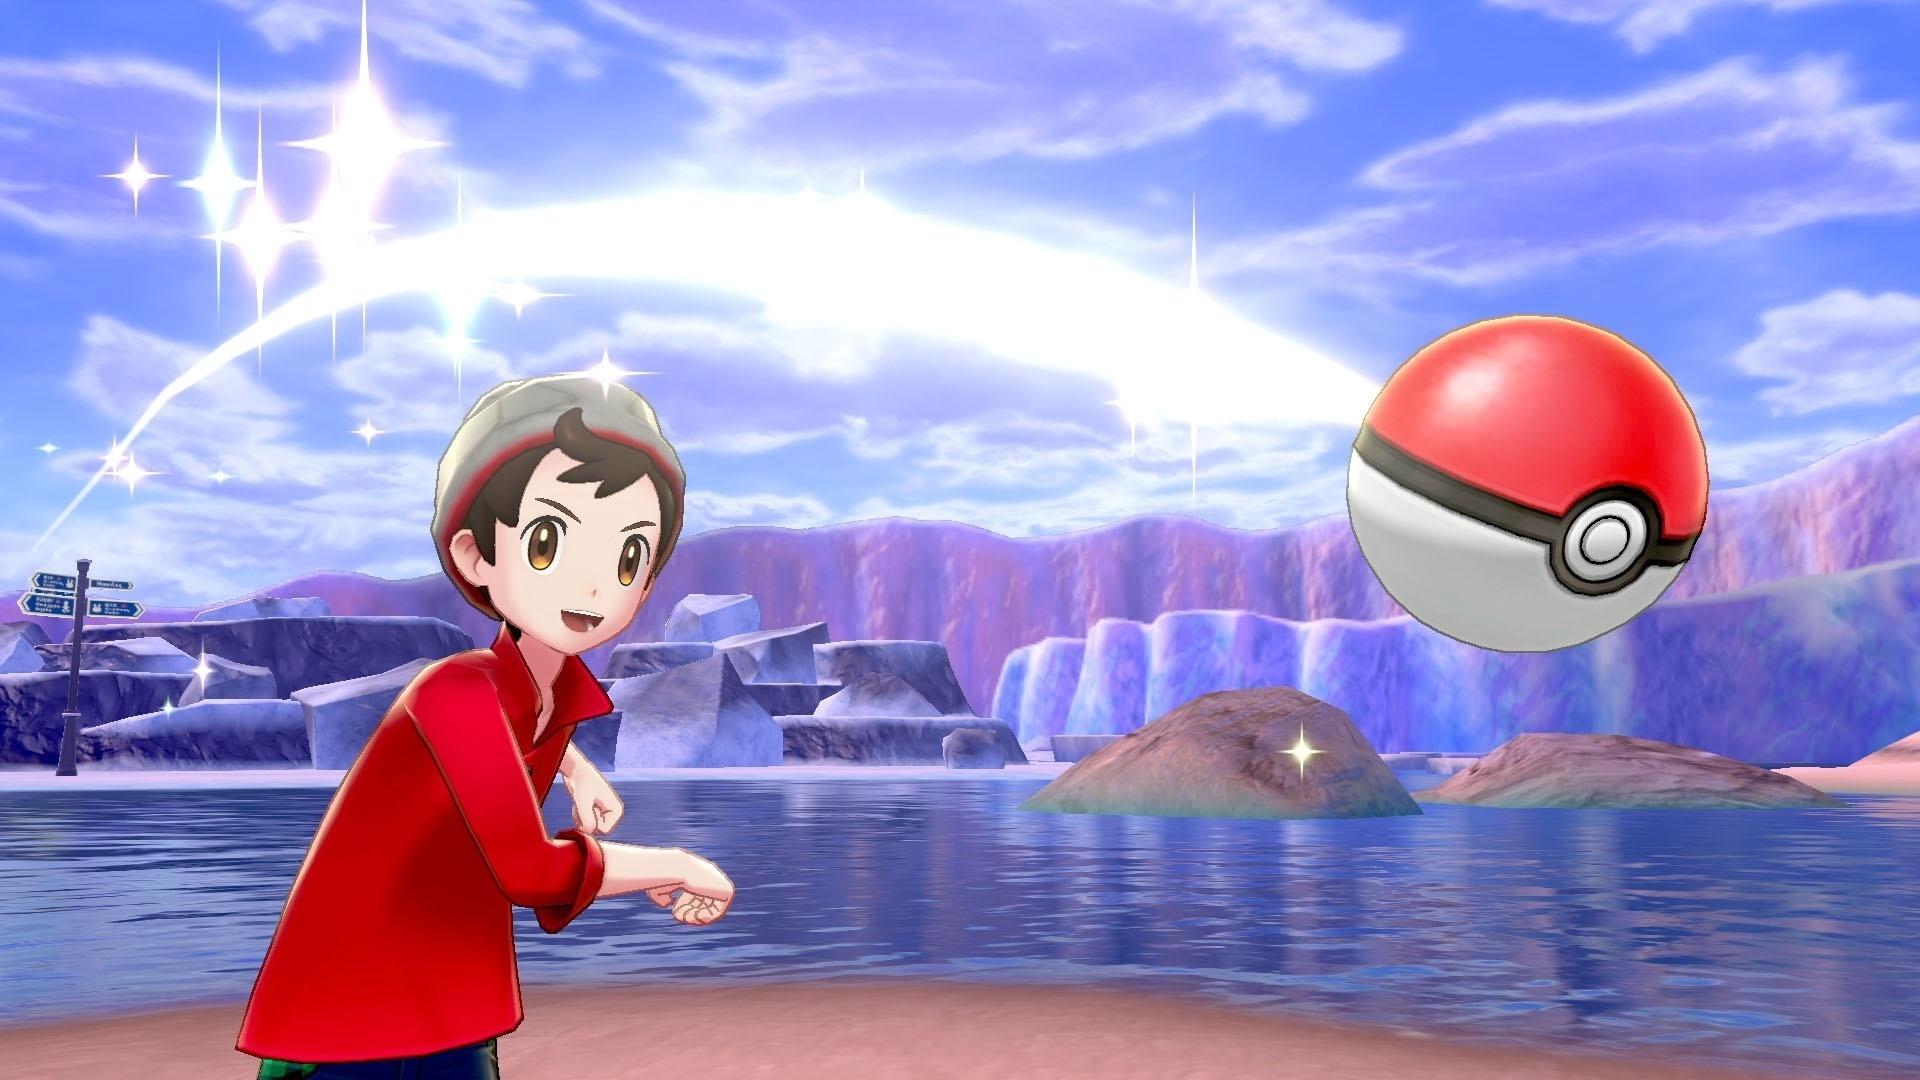 Pokemon Sword and Shield разошлись тиражом в16 млн копий за полтора месяца